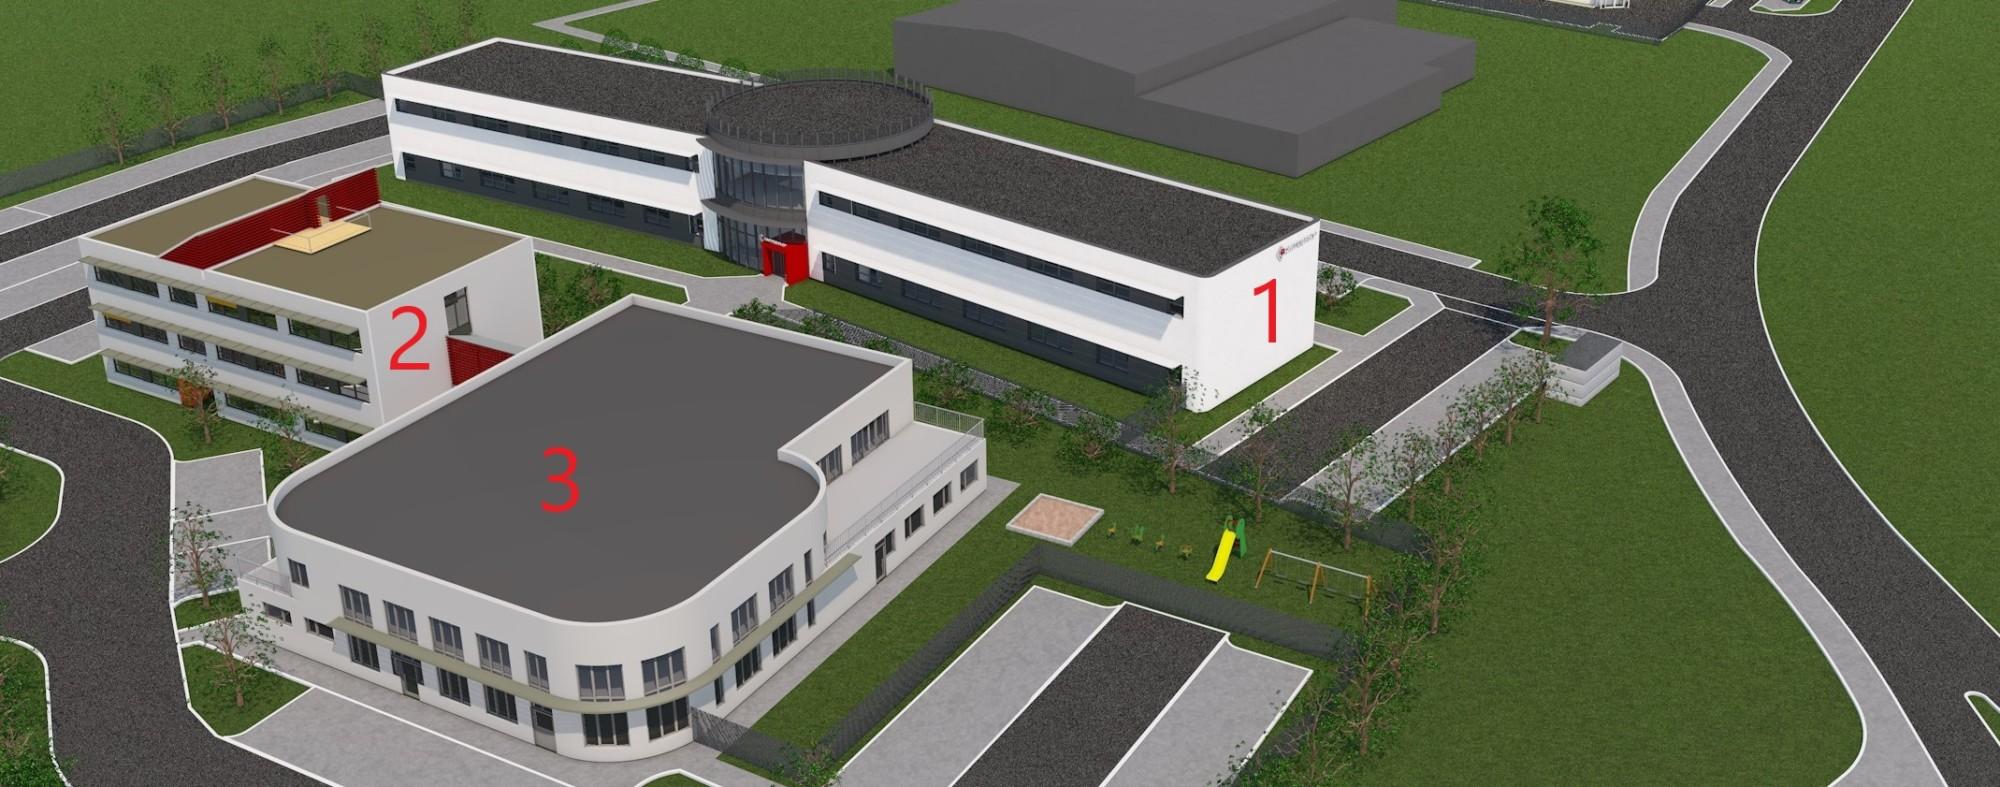 105 korozní laboratoř 3D.jpg 2